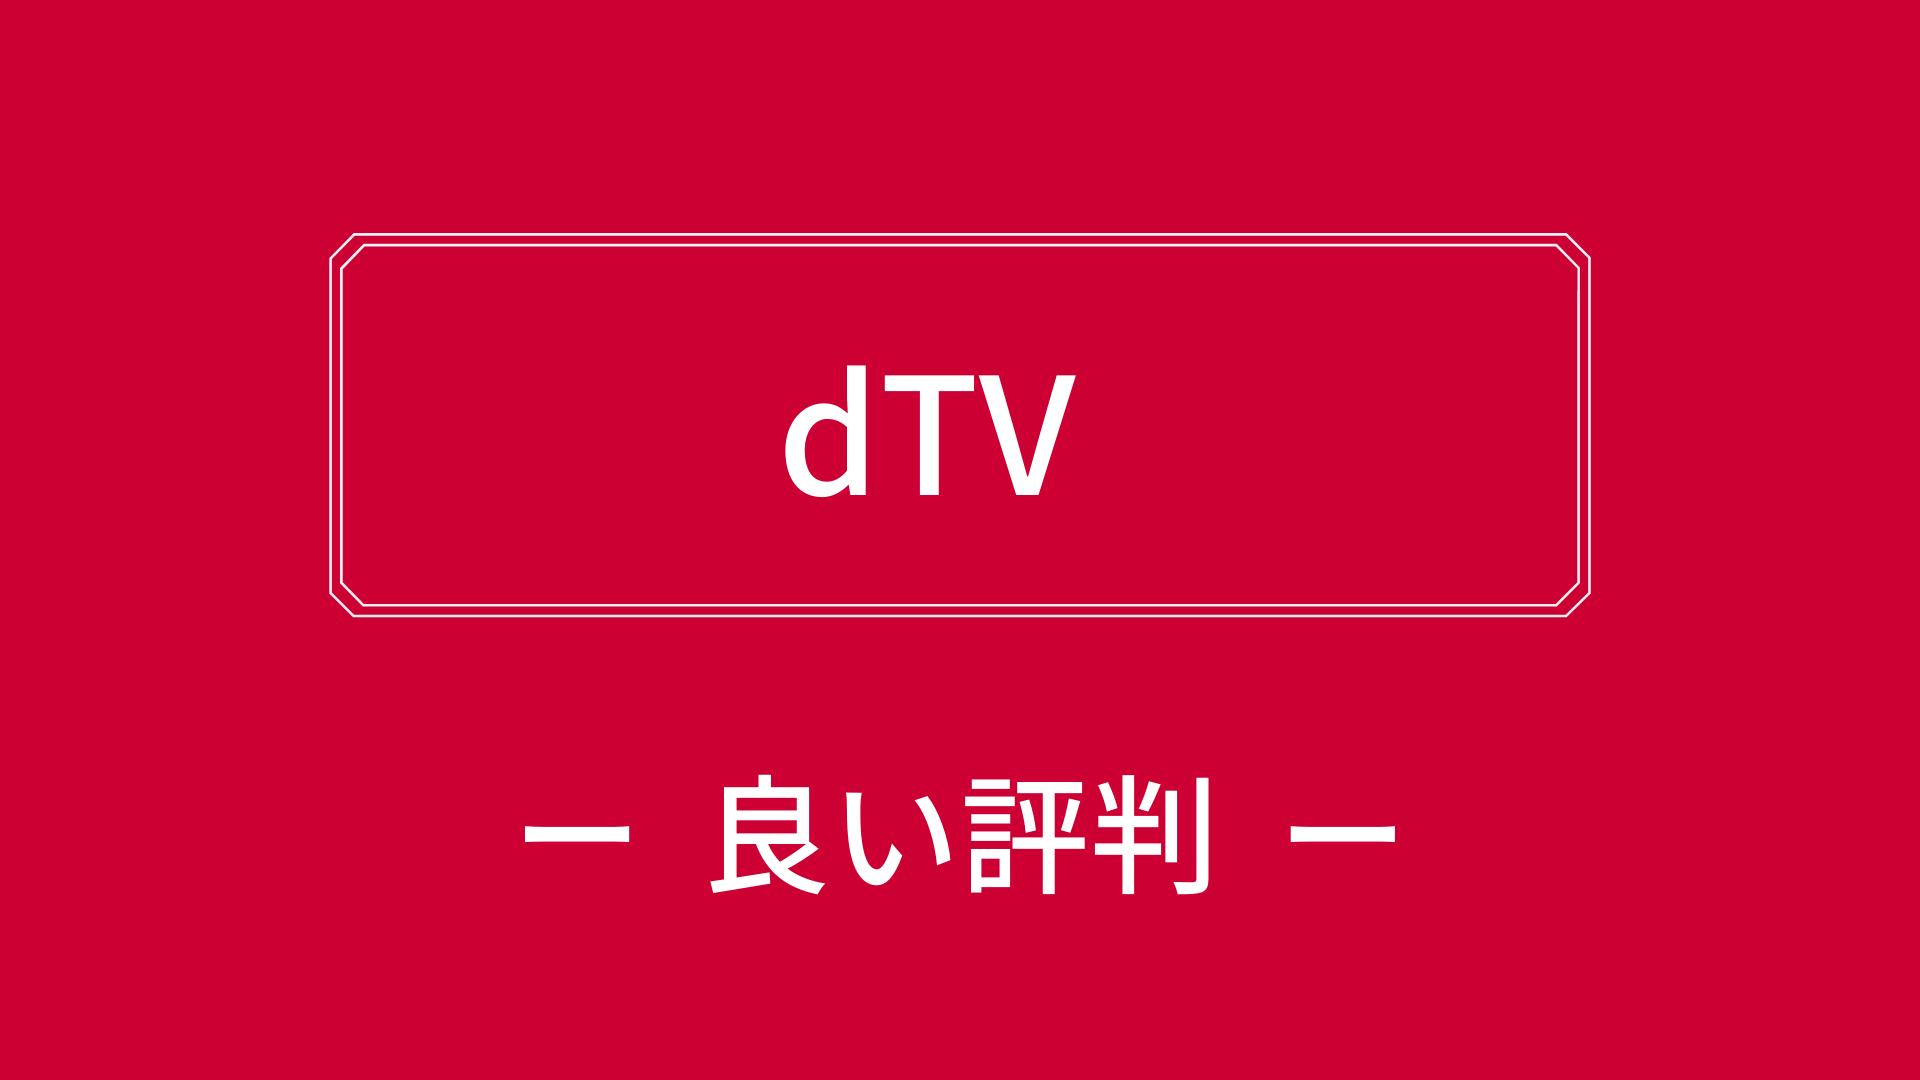 dTVの良い評判・口コミ